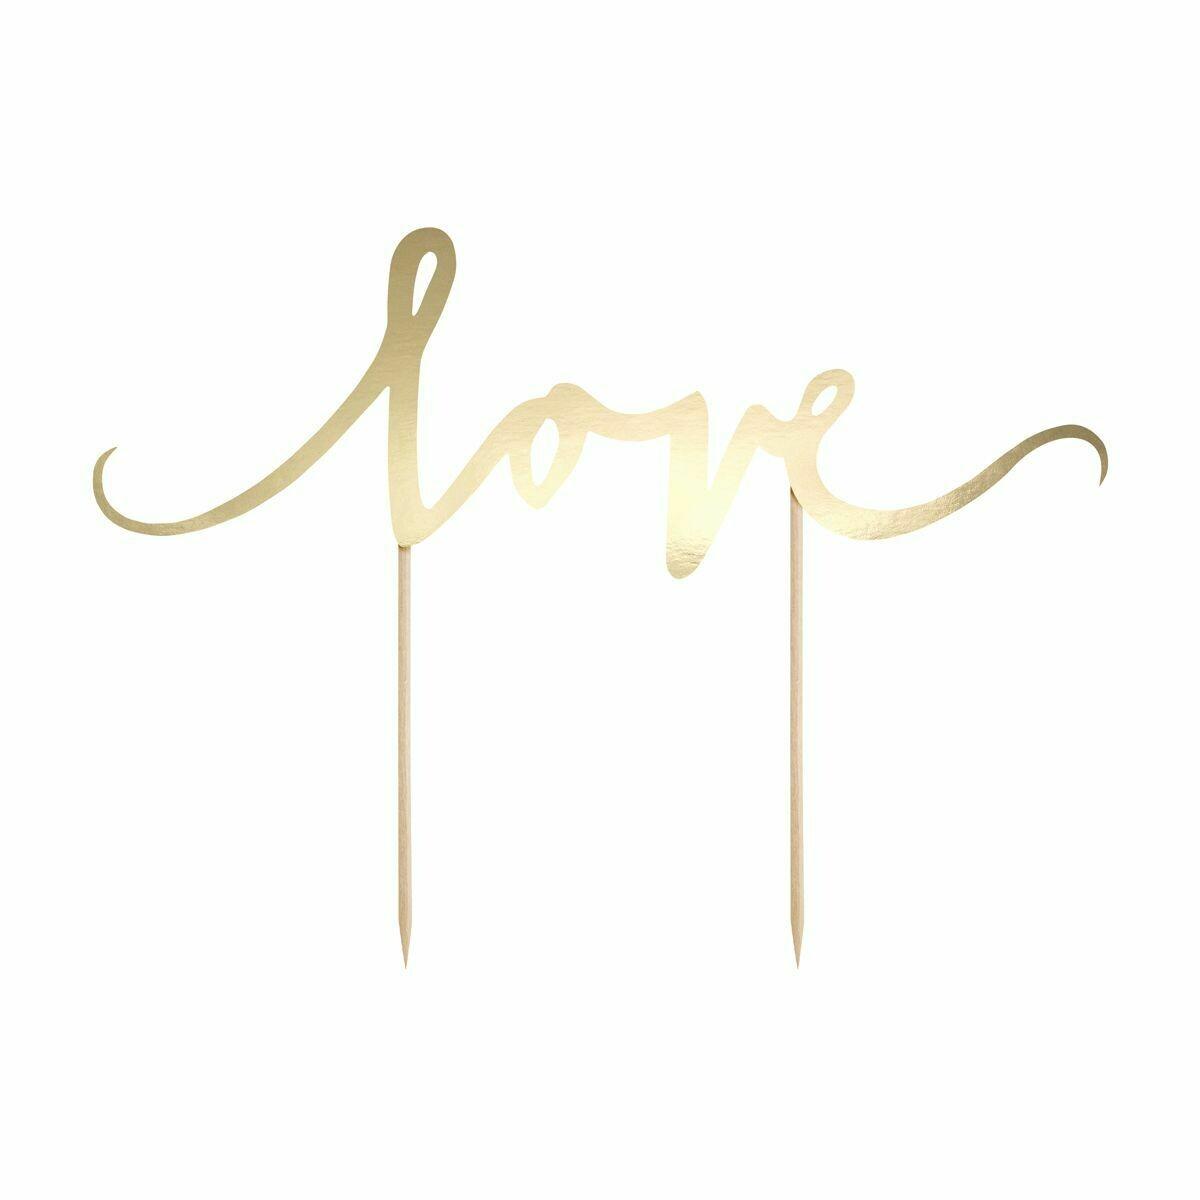 PartyDeco Cake Topper 'Love' - GOLD -Τόπερ Τούρτας Χρυσό 'Love'